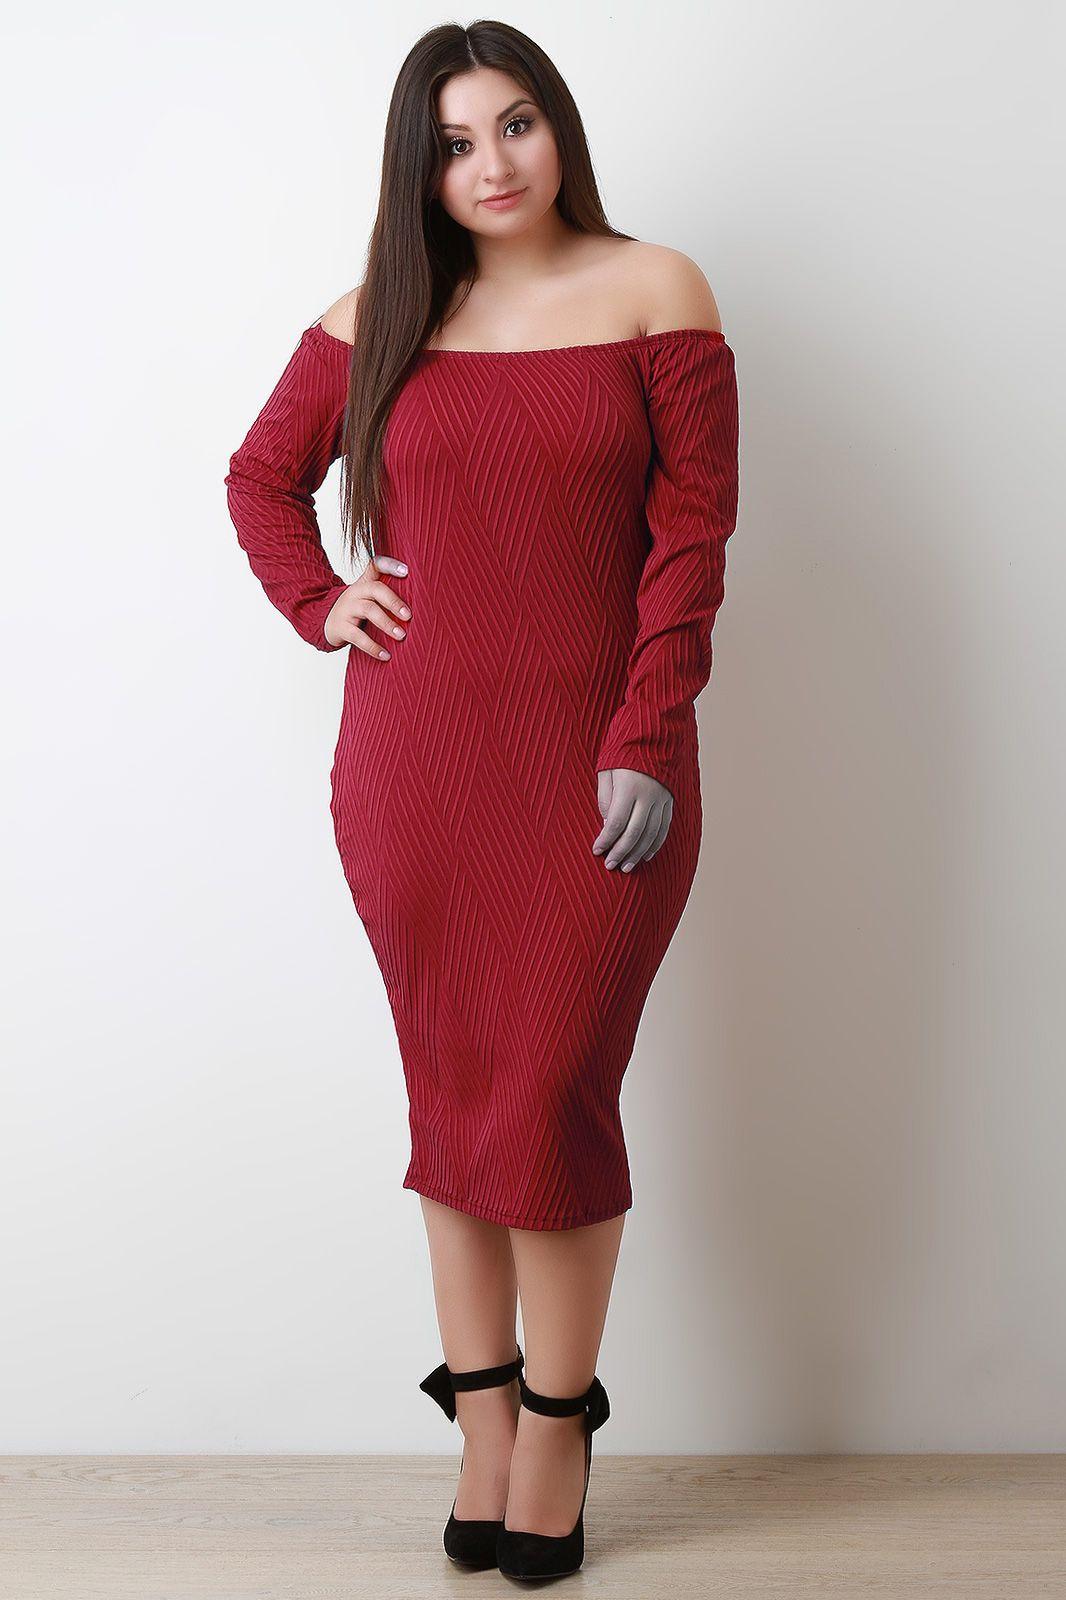 Free sh u easy returns shop this plus size bodycon dress features